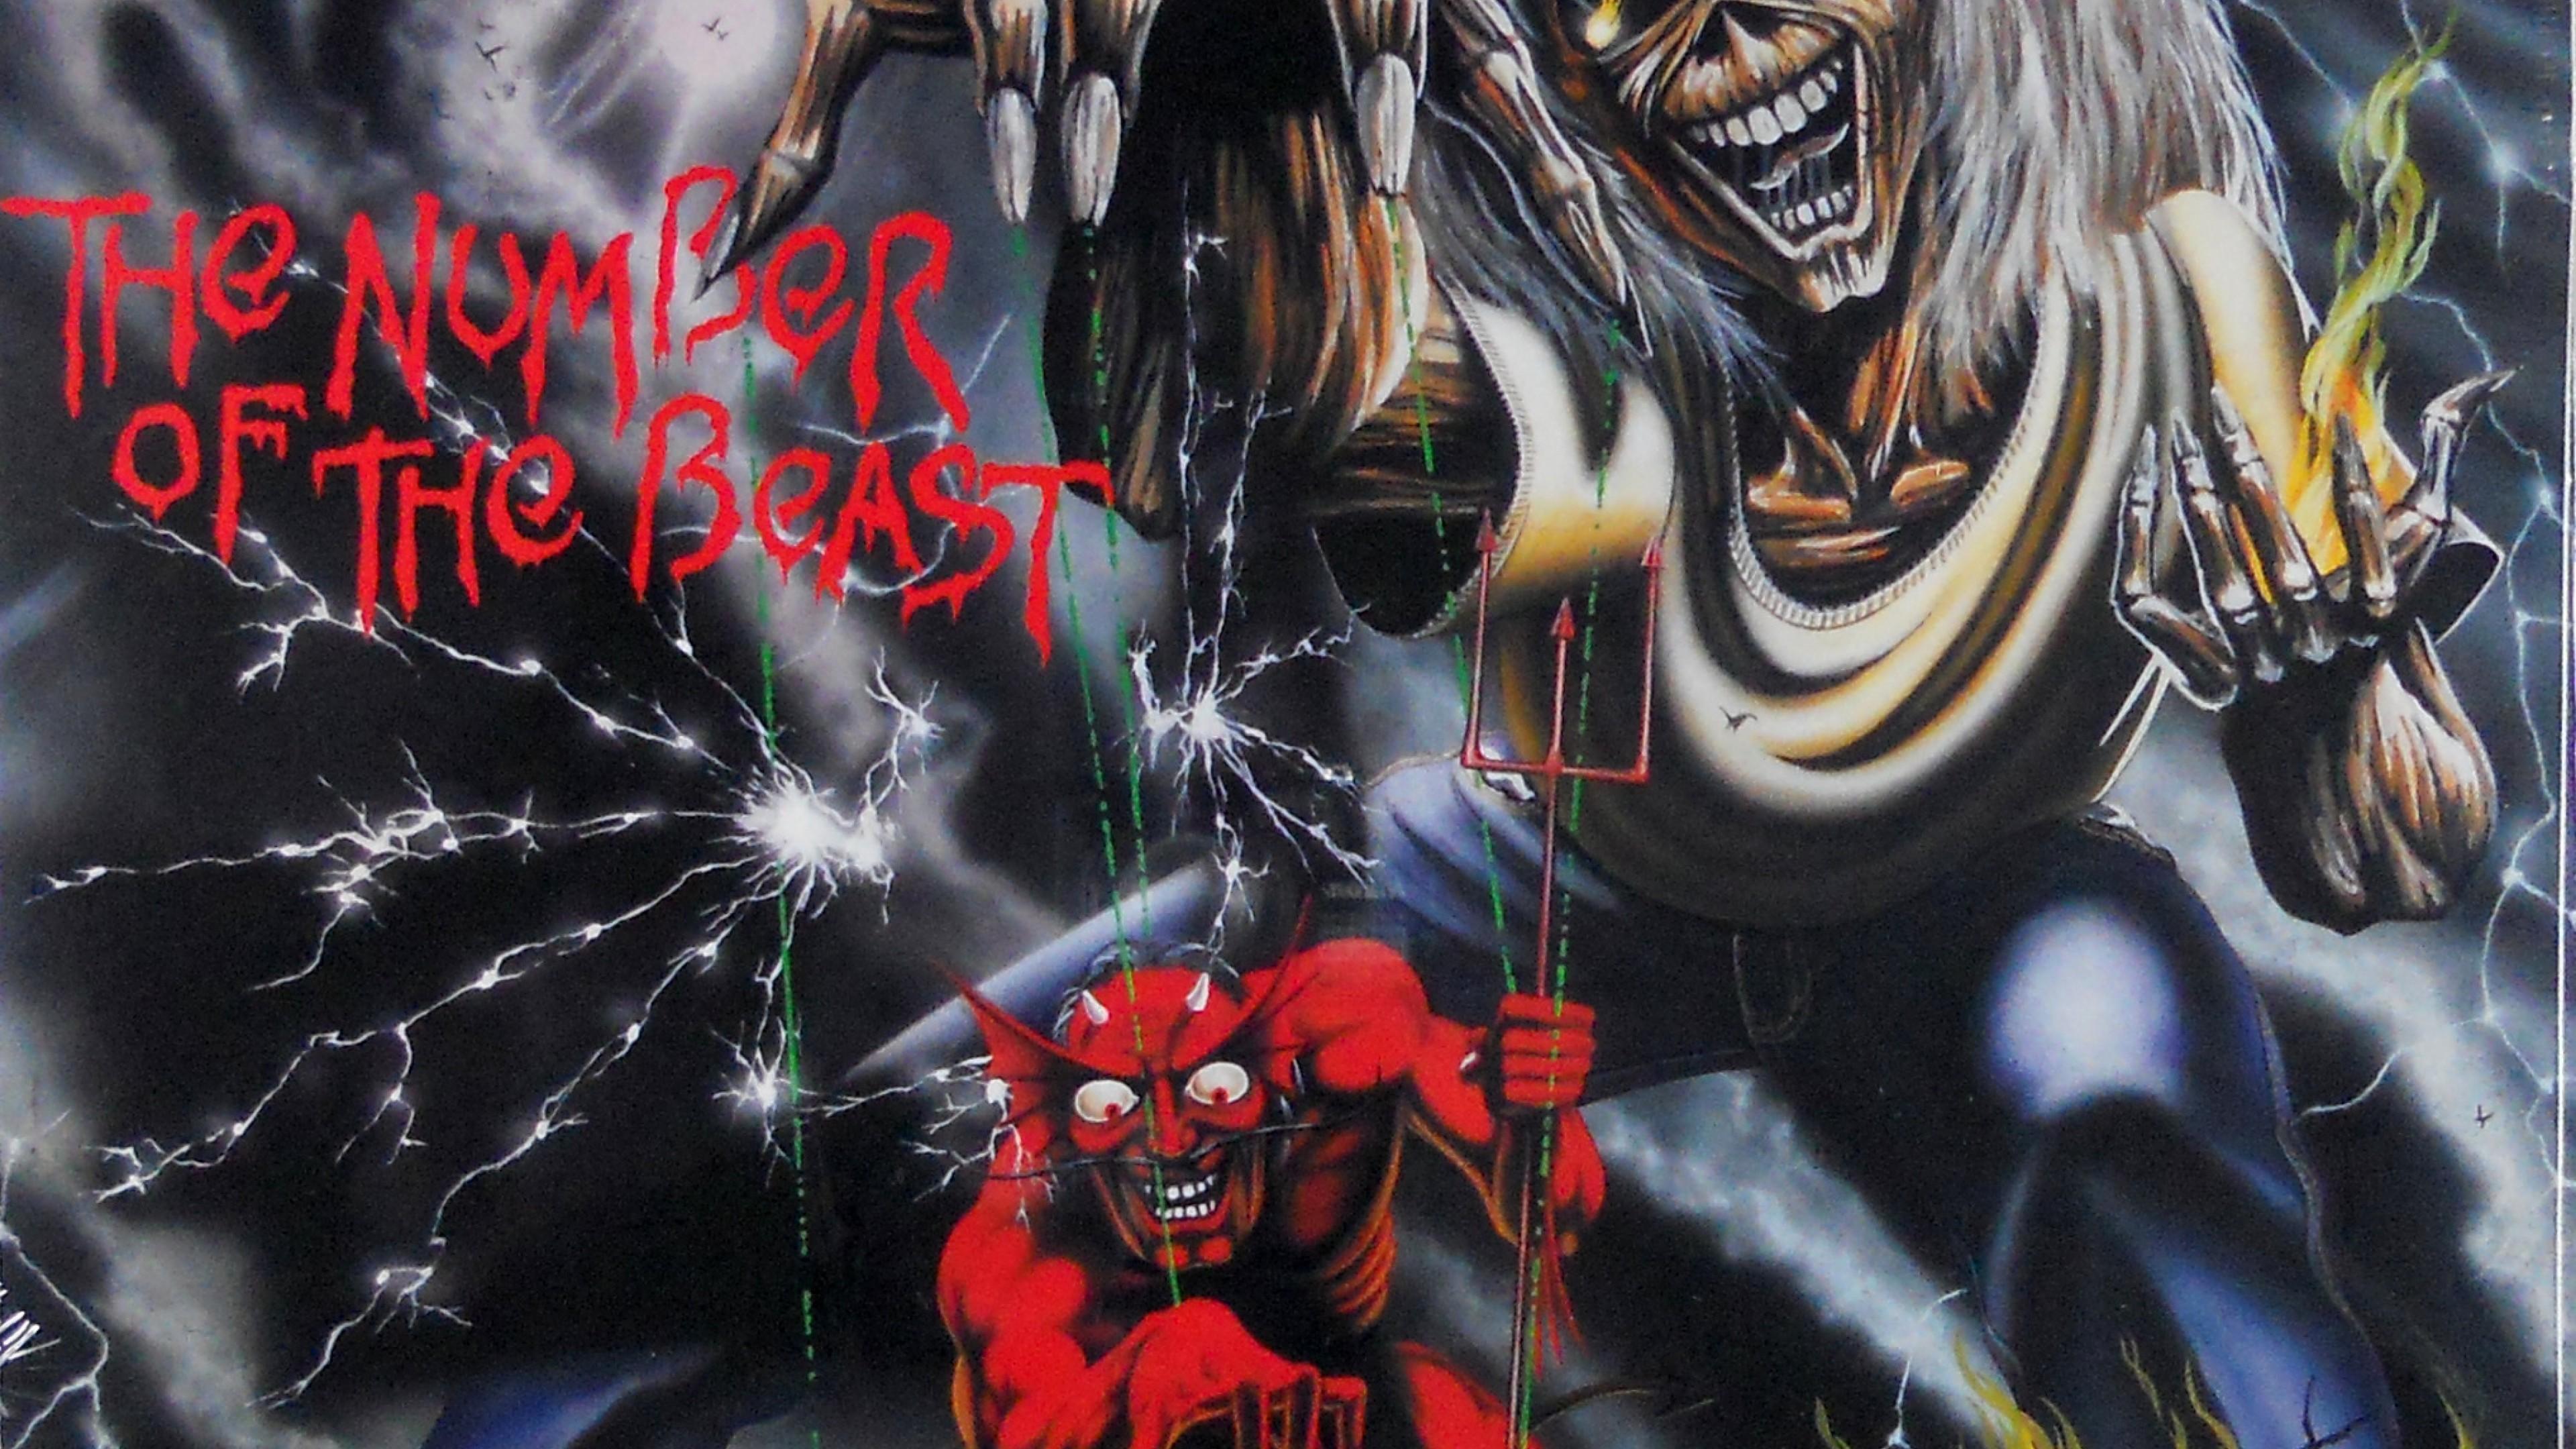 Iron Maiden Desktop Wallpaper: Iron Maiden Wallpaper 1920x1080 (79+ Images